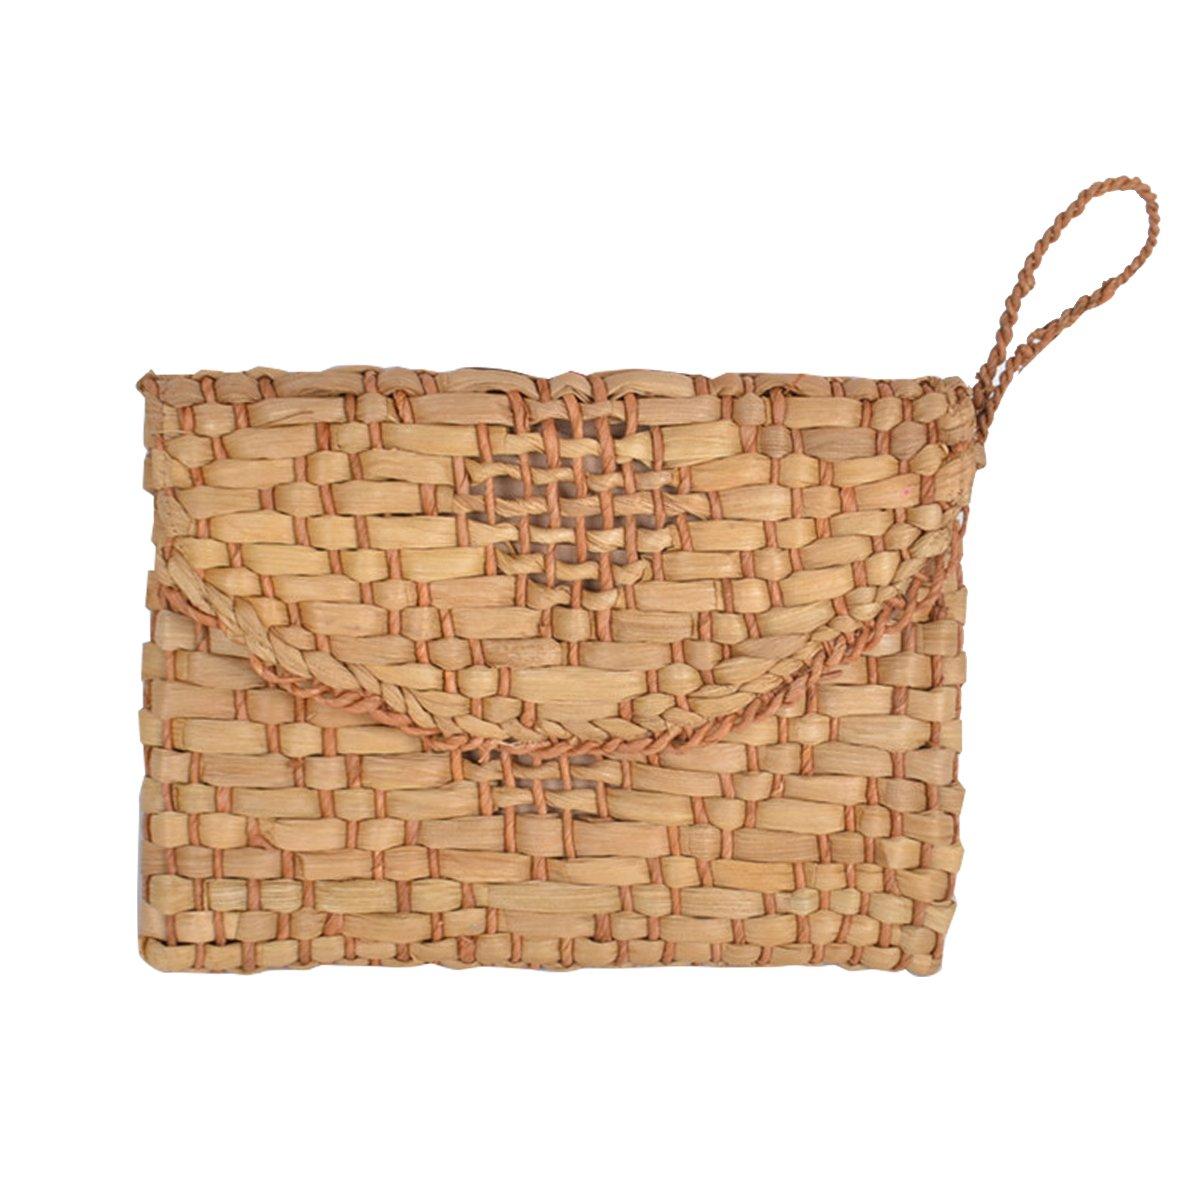 Straw Clutch Purse, JOSEKO Women Wristlet Clutch Handbag Envelope Bag Large Wallet Summer Beach Bag